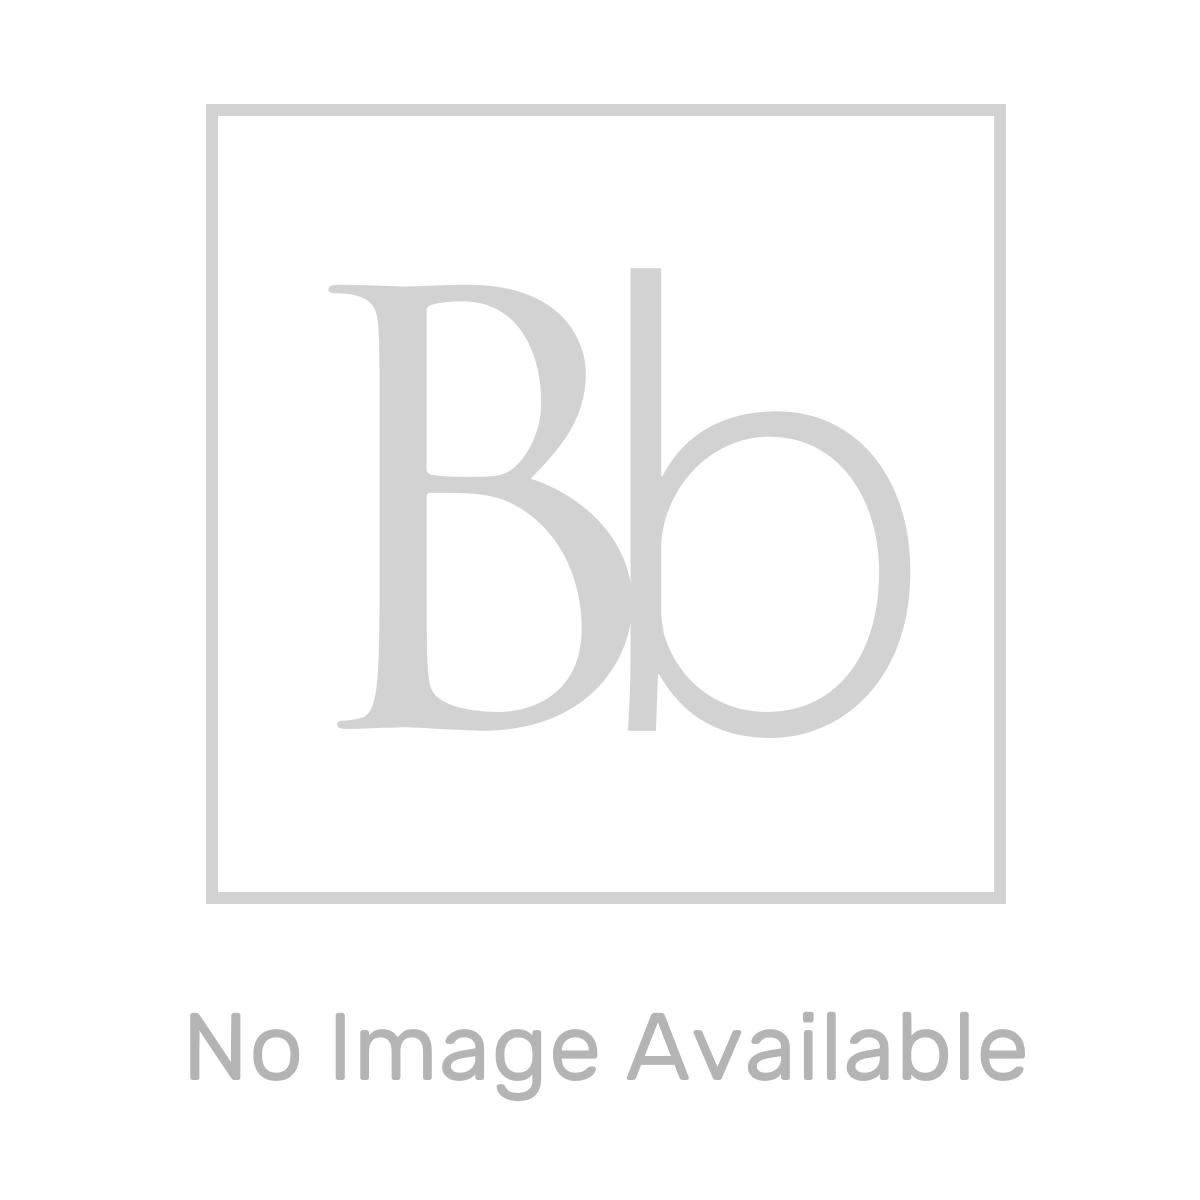 Nuie Eon Single Lever Mono Bidet Mixer Tap Line Drawing